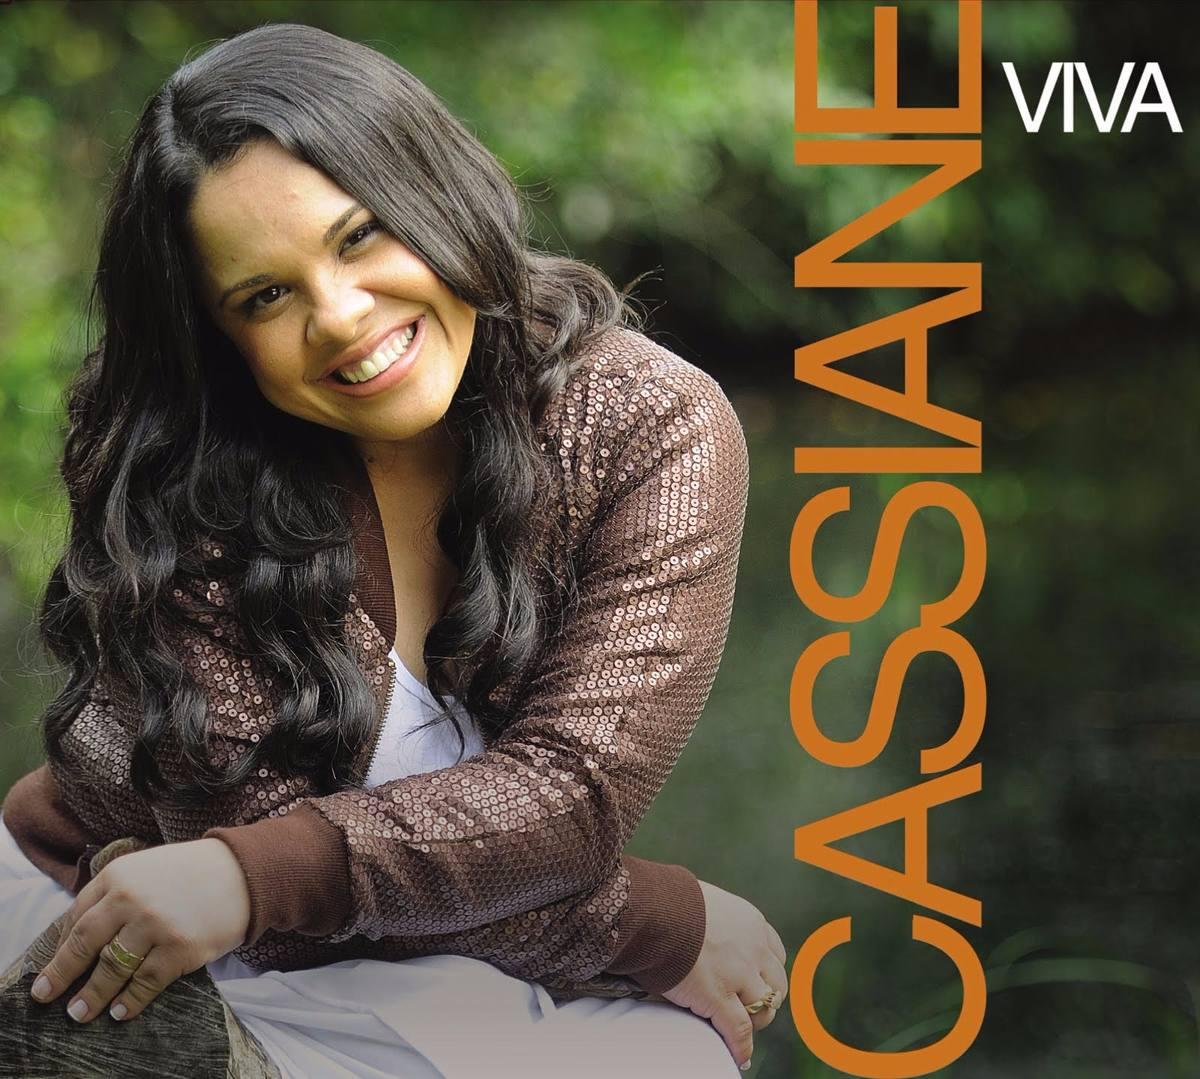 novo cd cassiane viva 2010